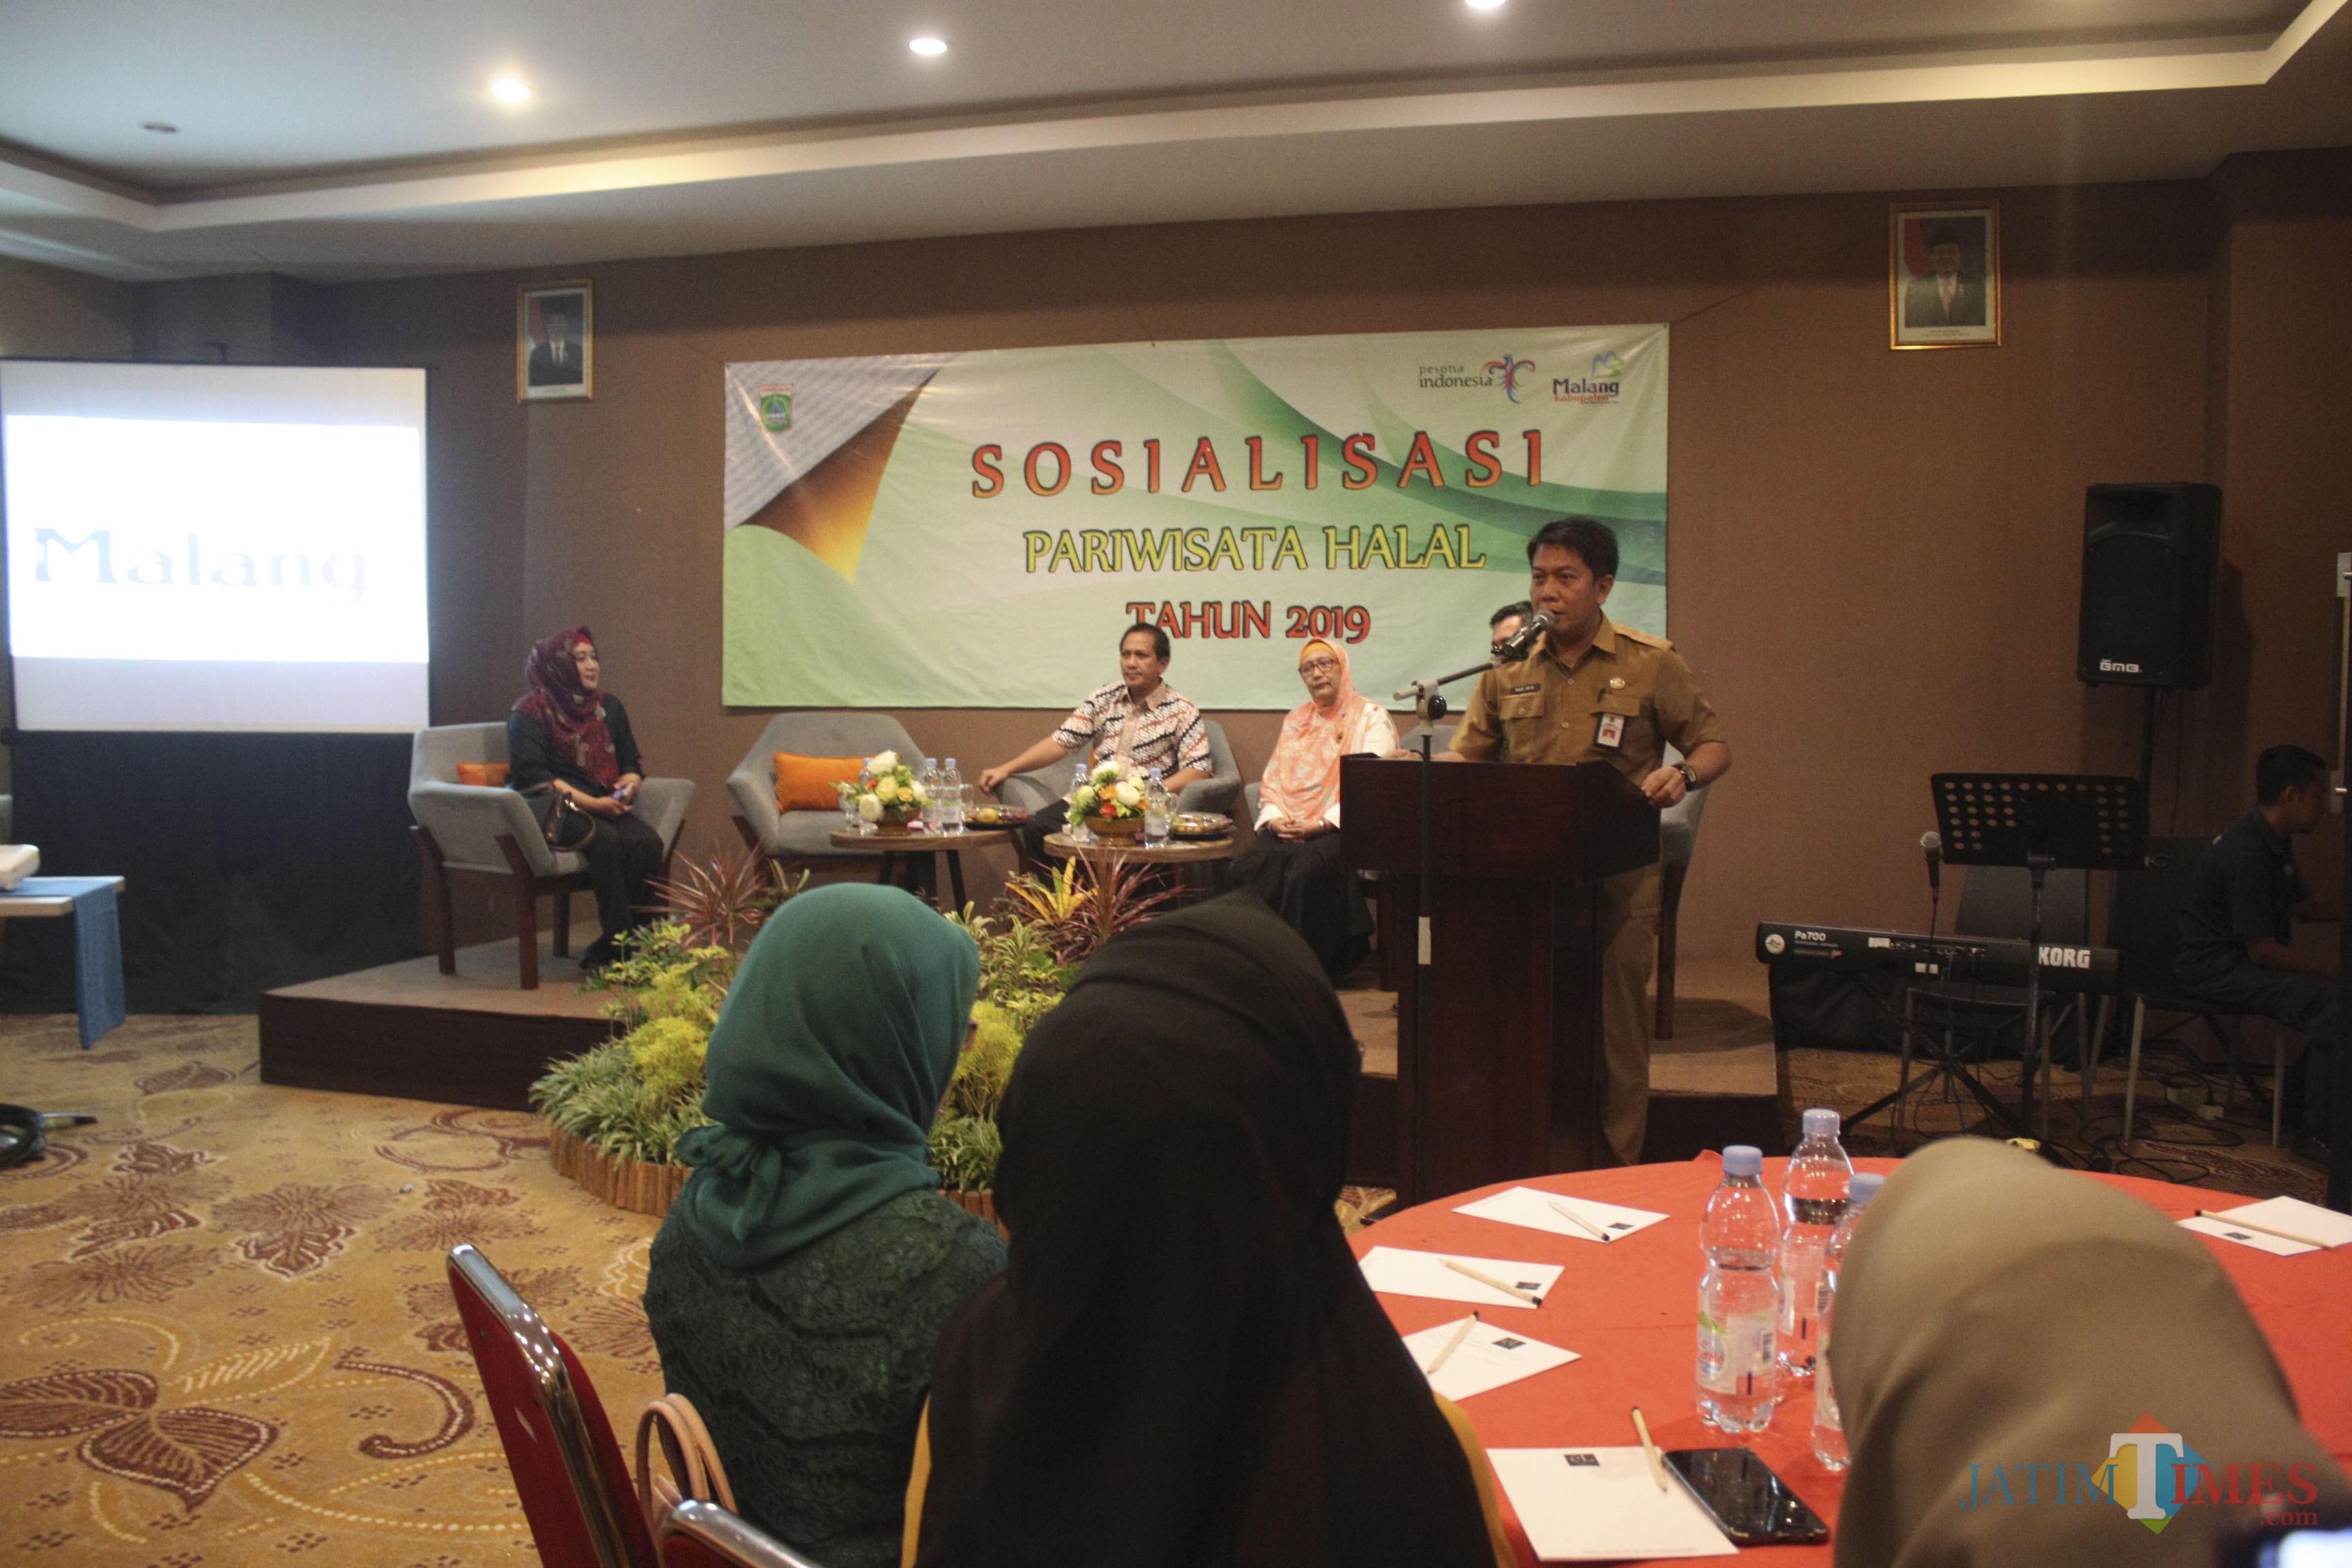 Kepala Disbudpar Kabupaten Malang Made Arya Wedhantara saat sambutan dalam Sosialisasi Pariwisata Halal Di El Hotel Grande (Luqmanul Hakim/Malang Times)